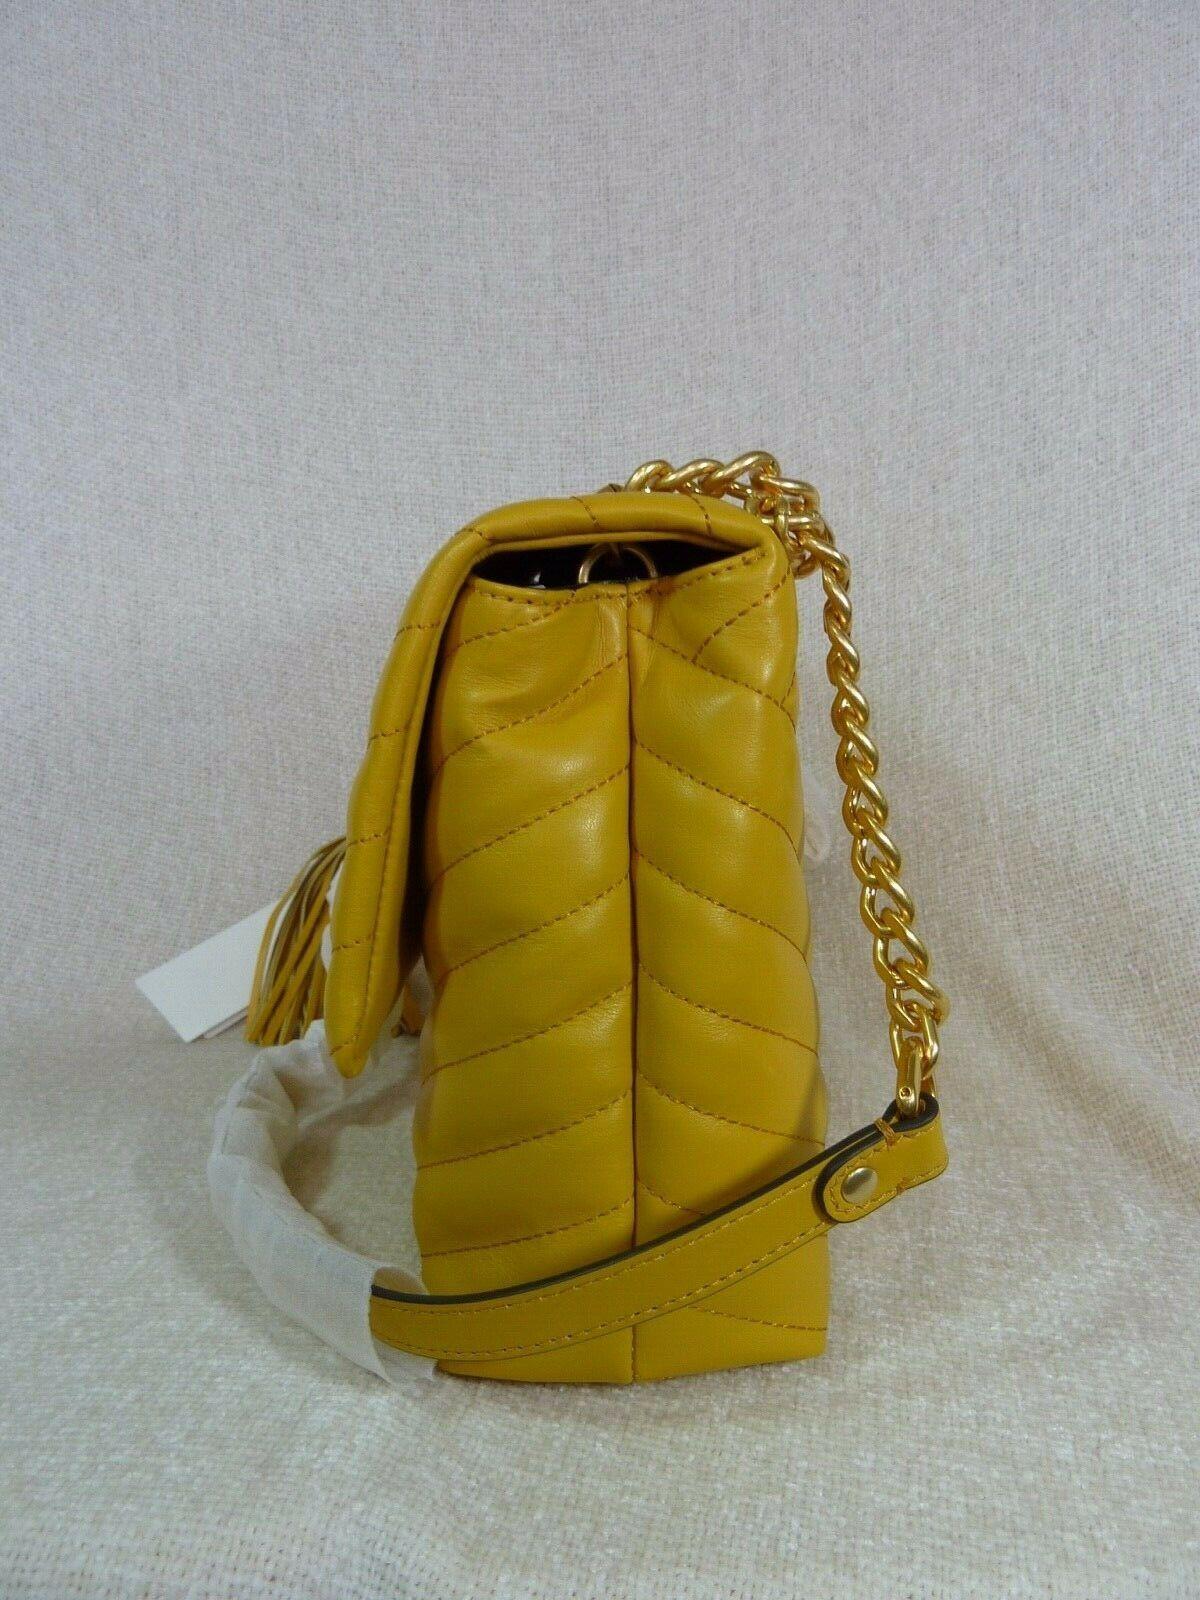 NWT Tory Burch Daylily Kira Chevron Flap Shoulder Bag $528 image 3